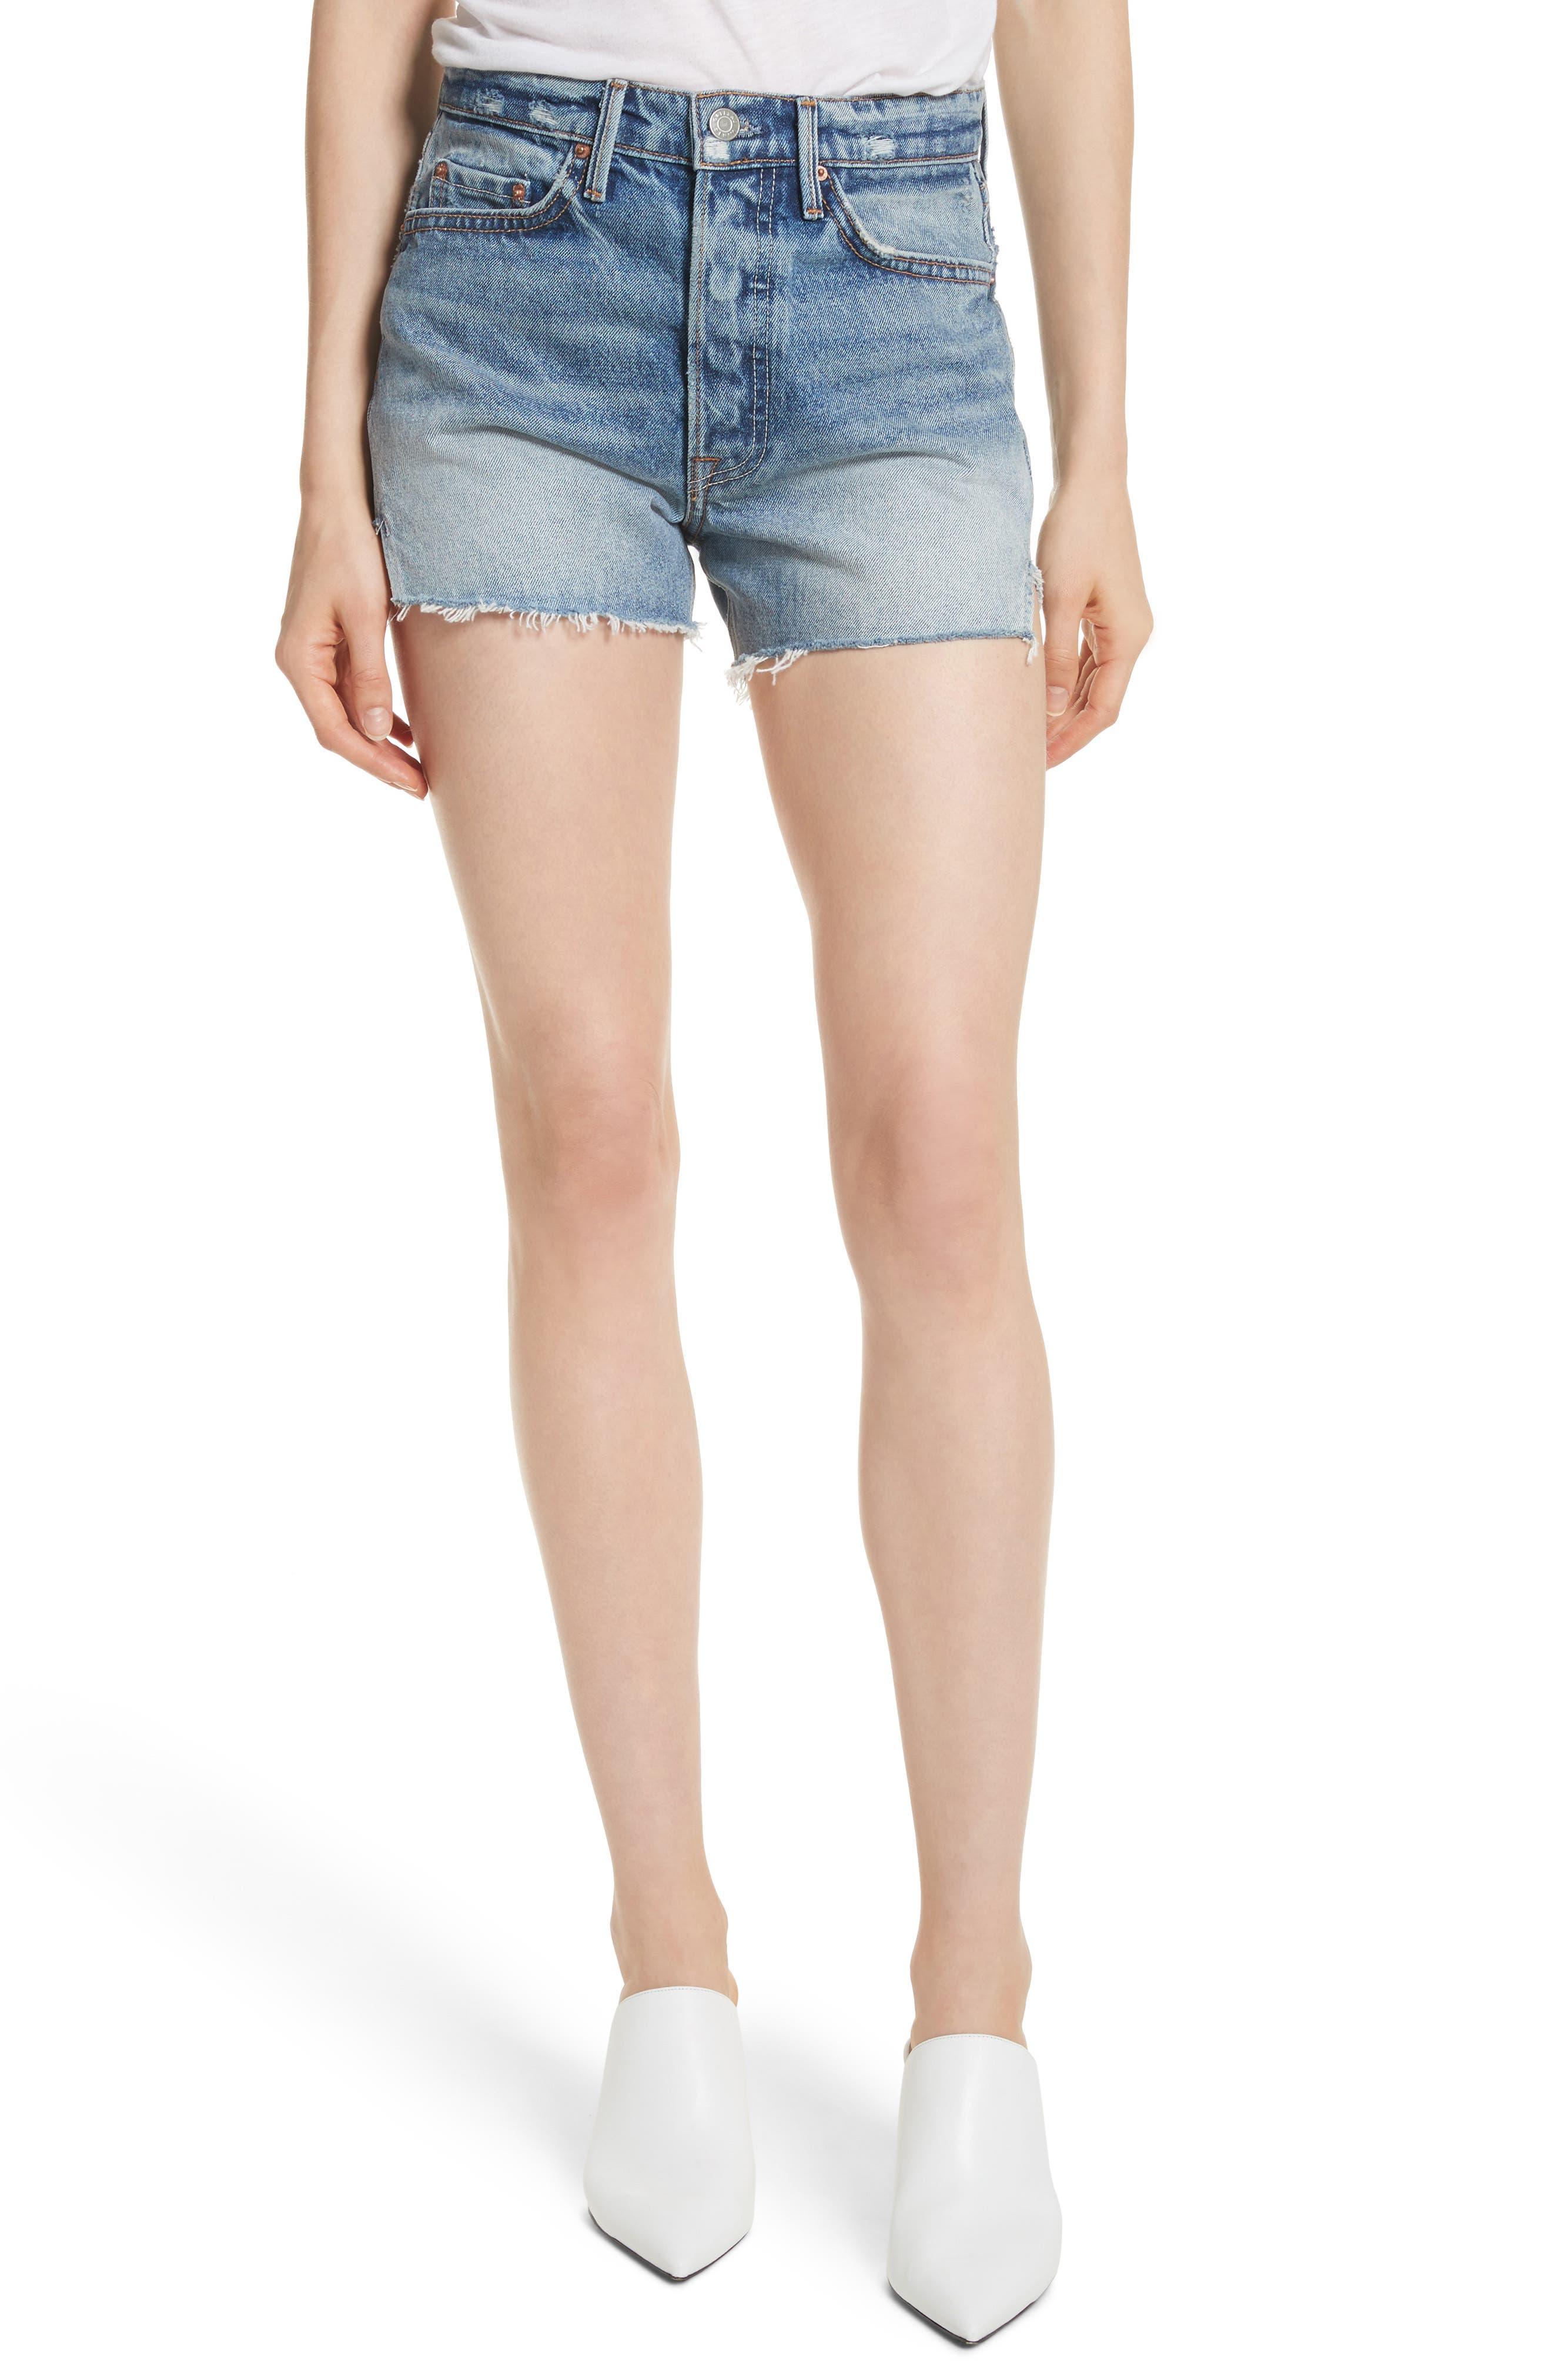 Mardee Denim Shorts,                         Main,                         color, 491